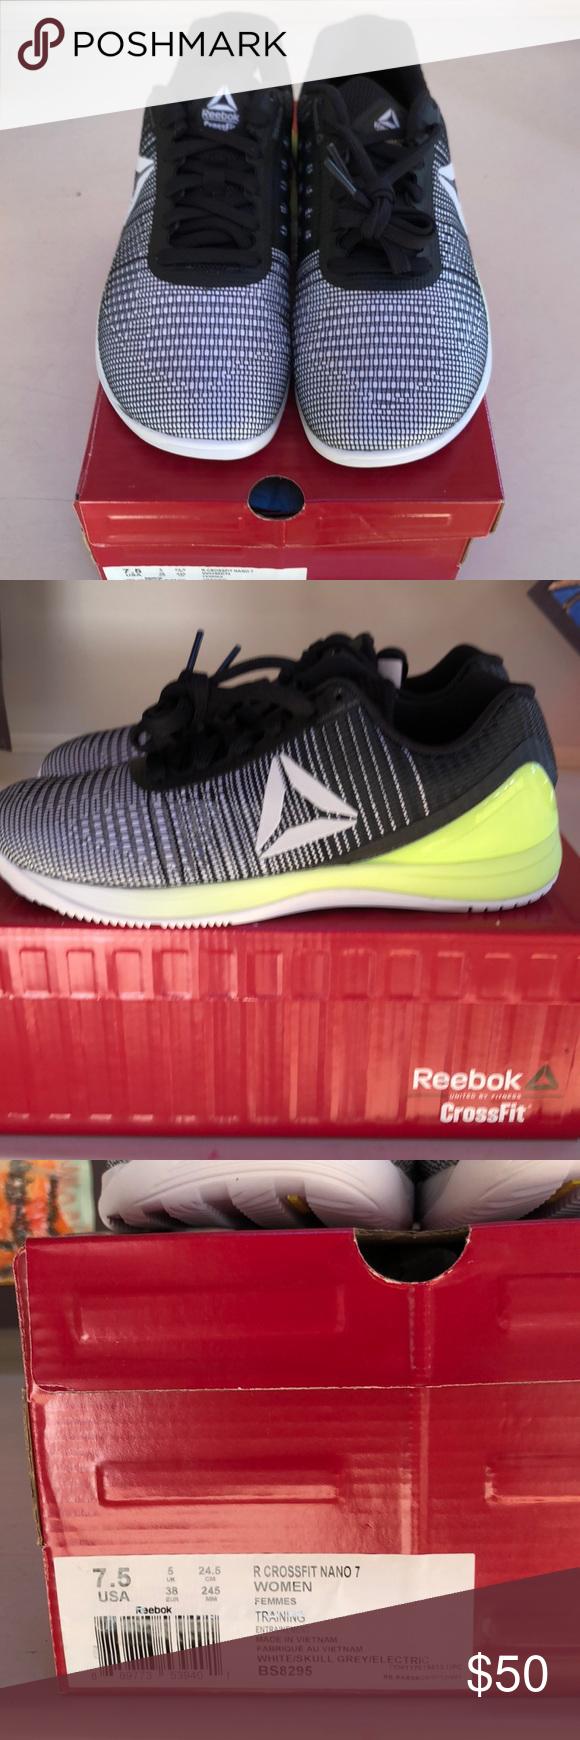 Reebok CrossFit Nano 7 Weave Brand new, never been worn